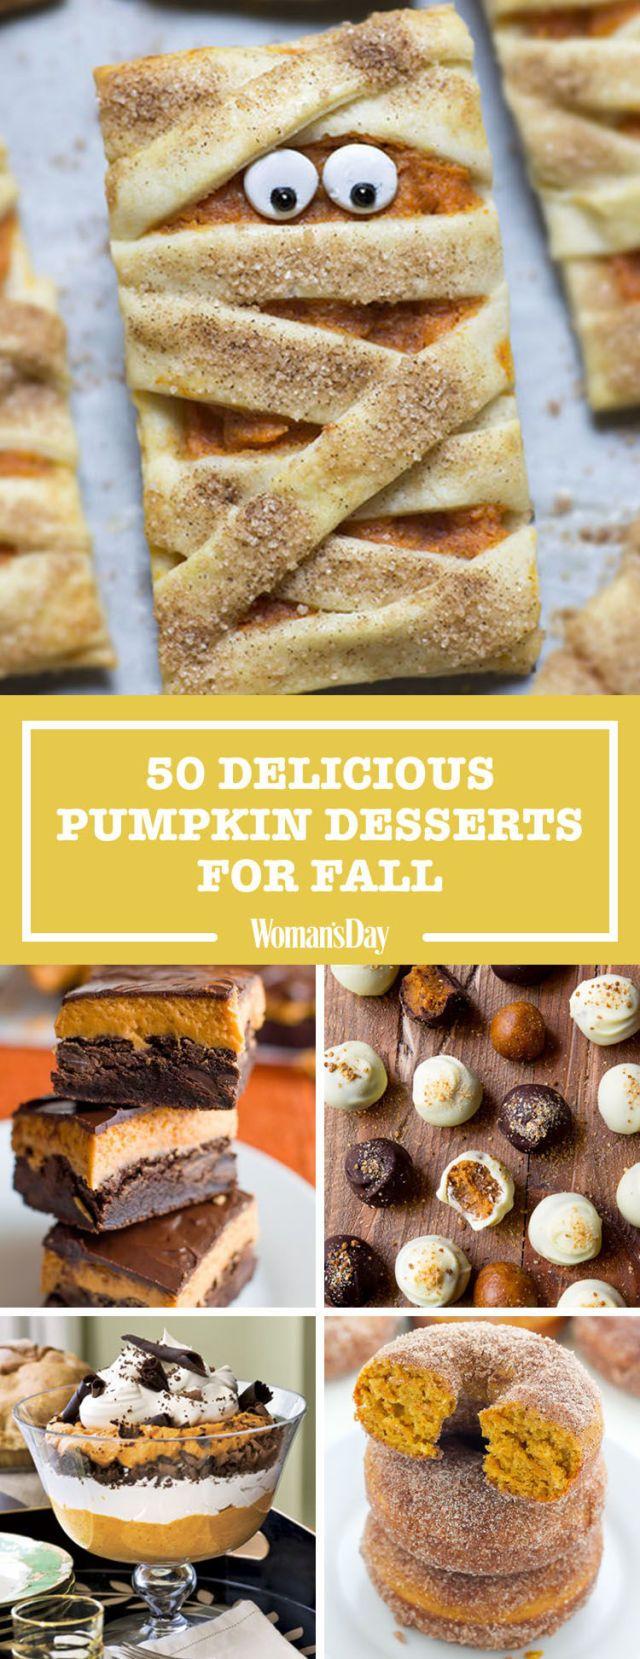 50 Palate-Pleasing Pumpkin Desserts for Fall - WomansDay.com